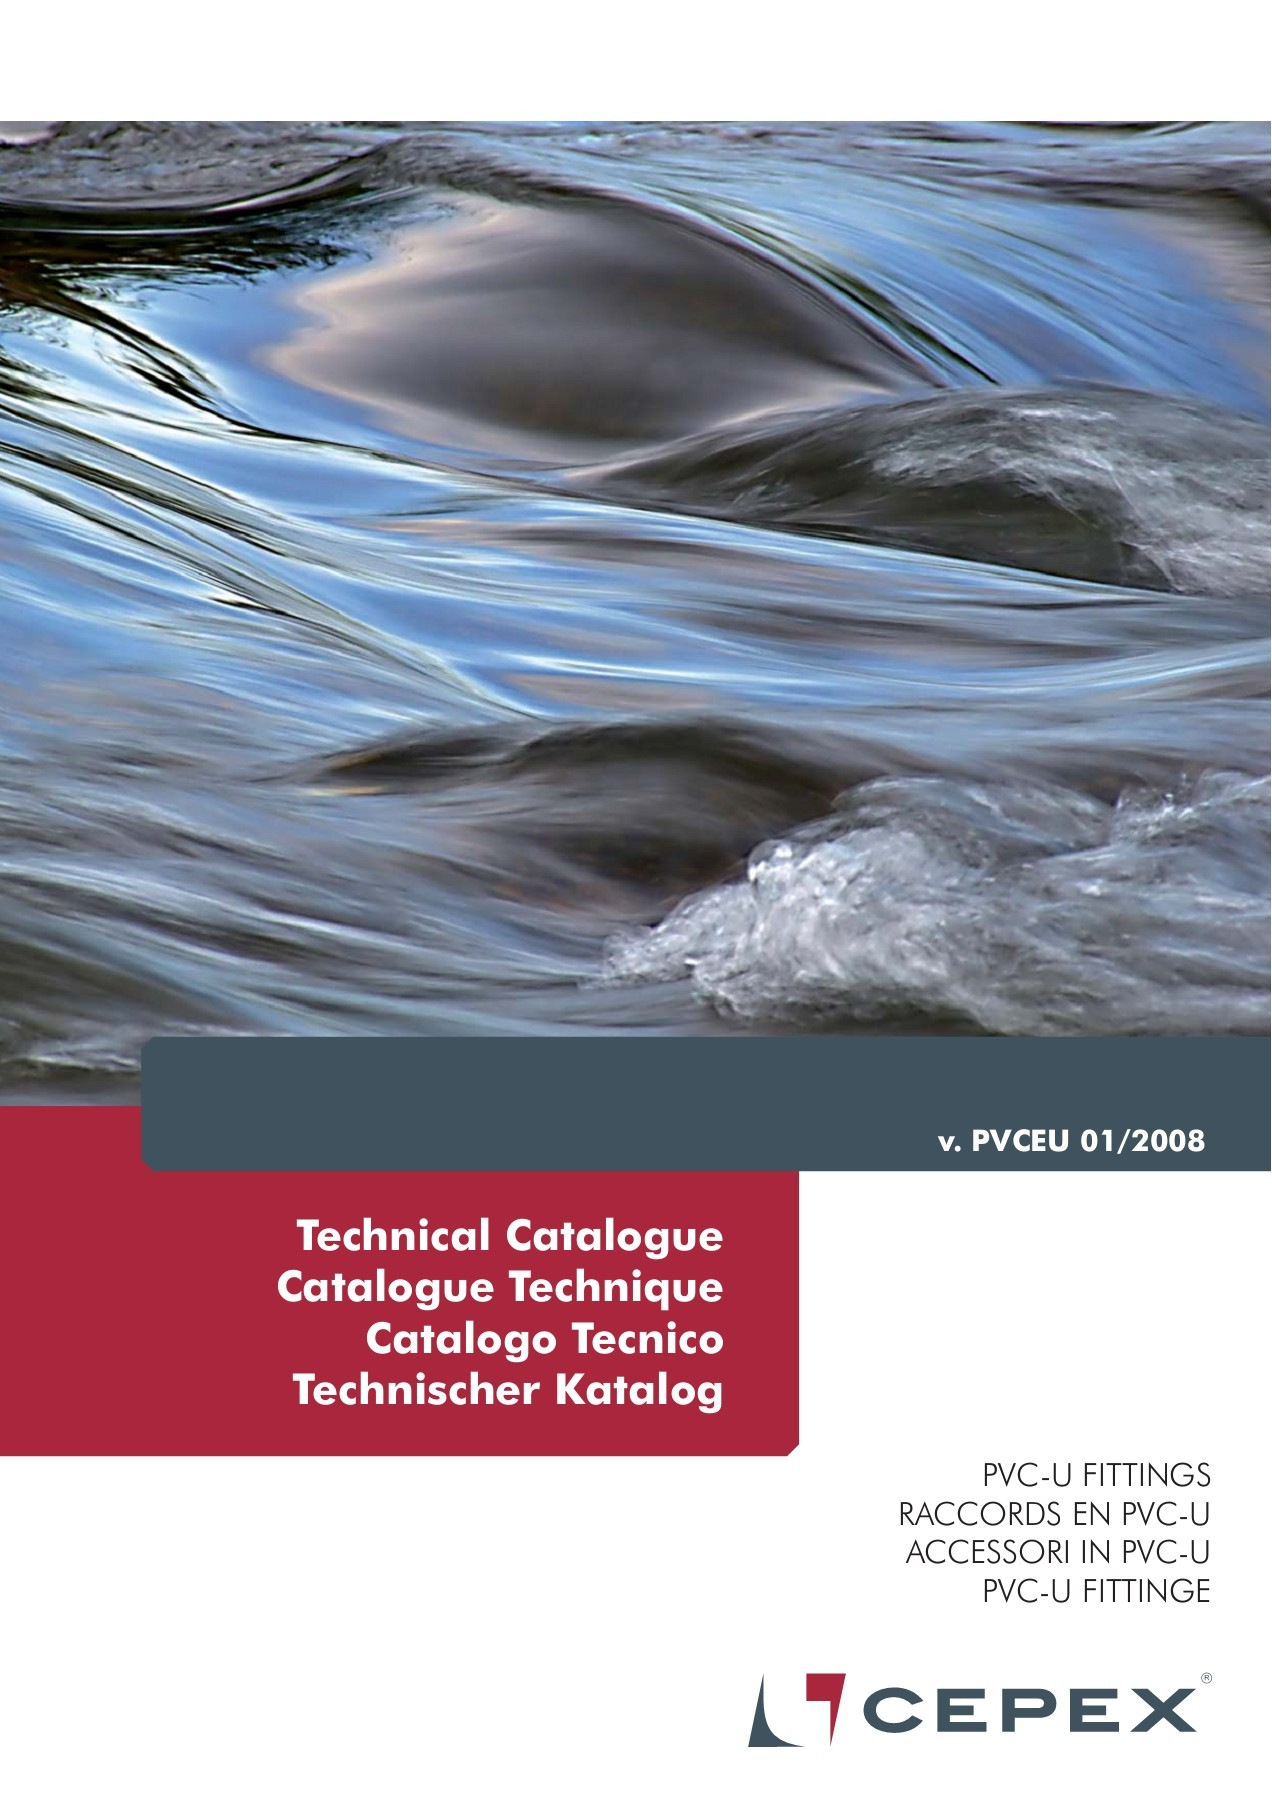 Table Jardin Pvc Charmant Technical Catalogue Catalogue Technique Catalogo Tecnico Of 34 Nouveau Table Jardin Pvc